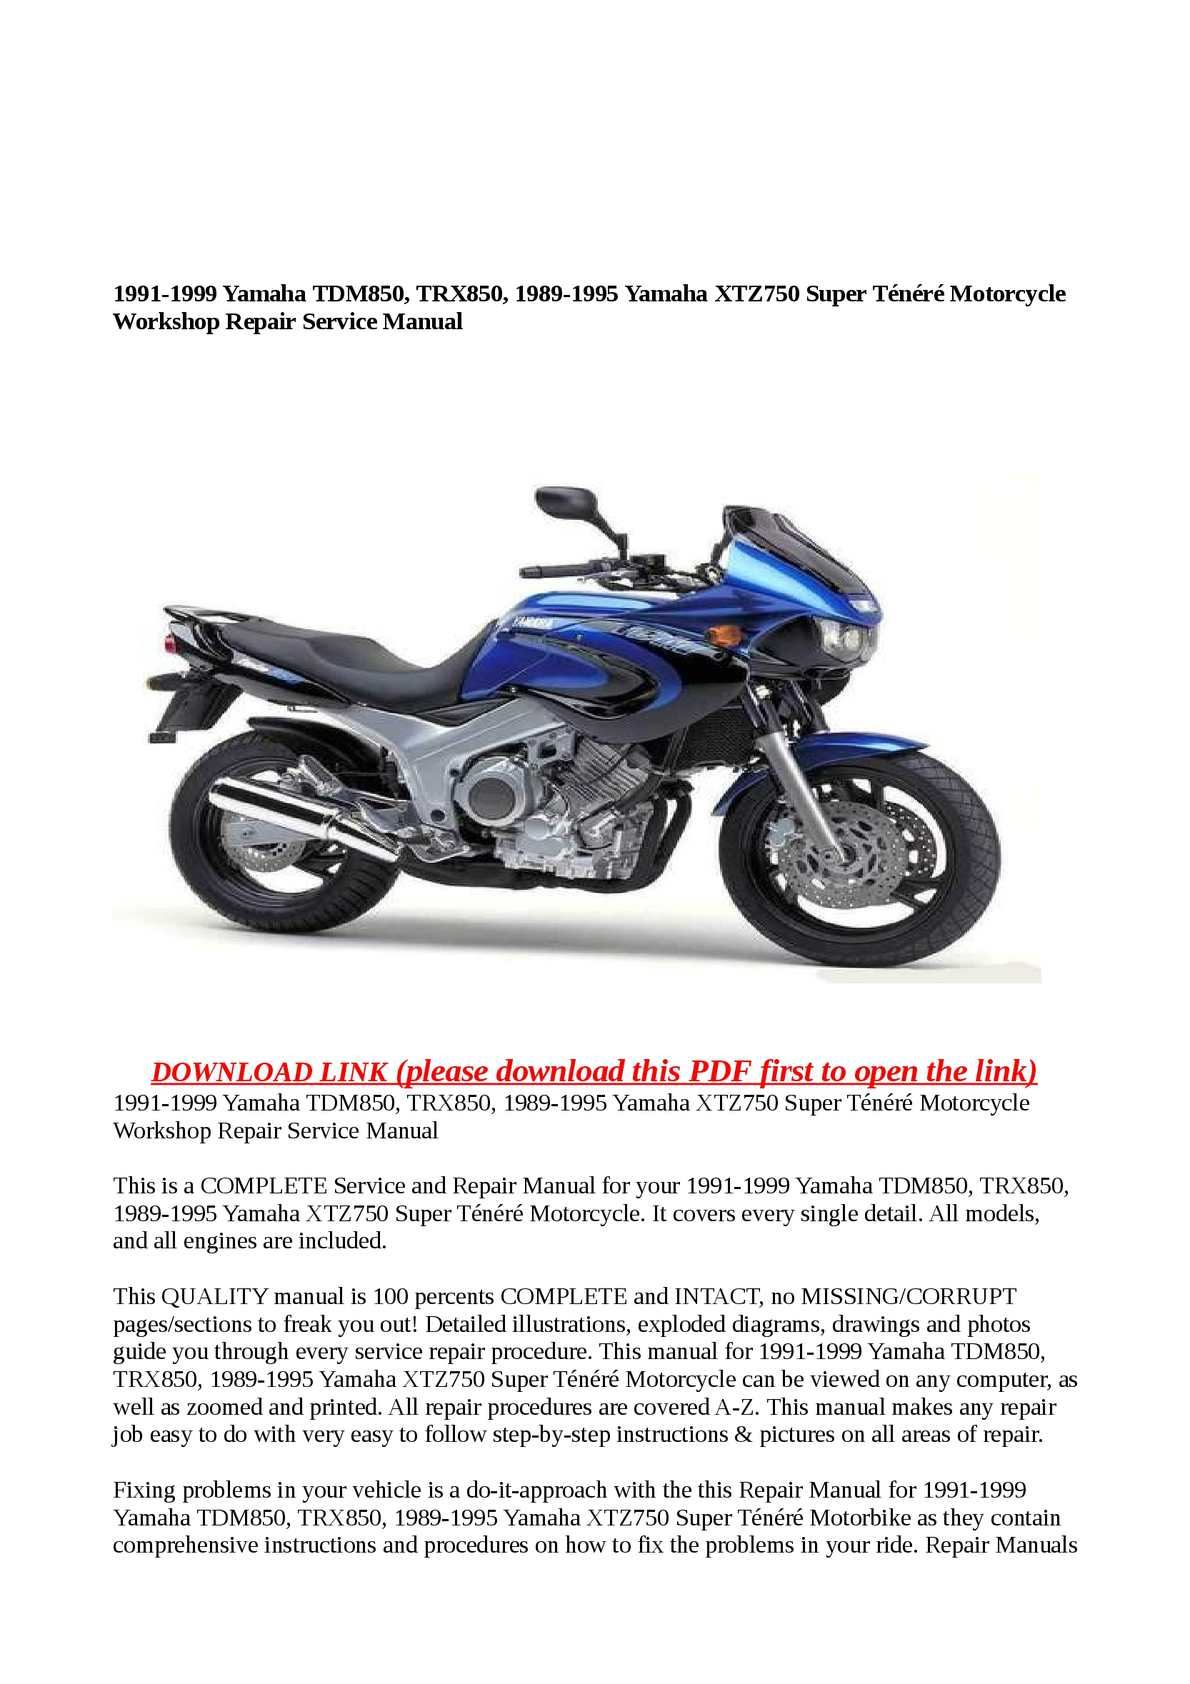 ... Array - yamaha motorcycle service manuals pdf motorview co rh motorview  co